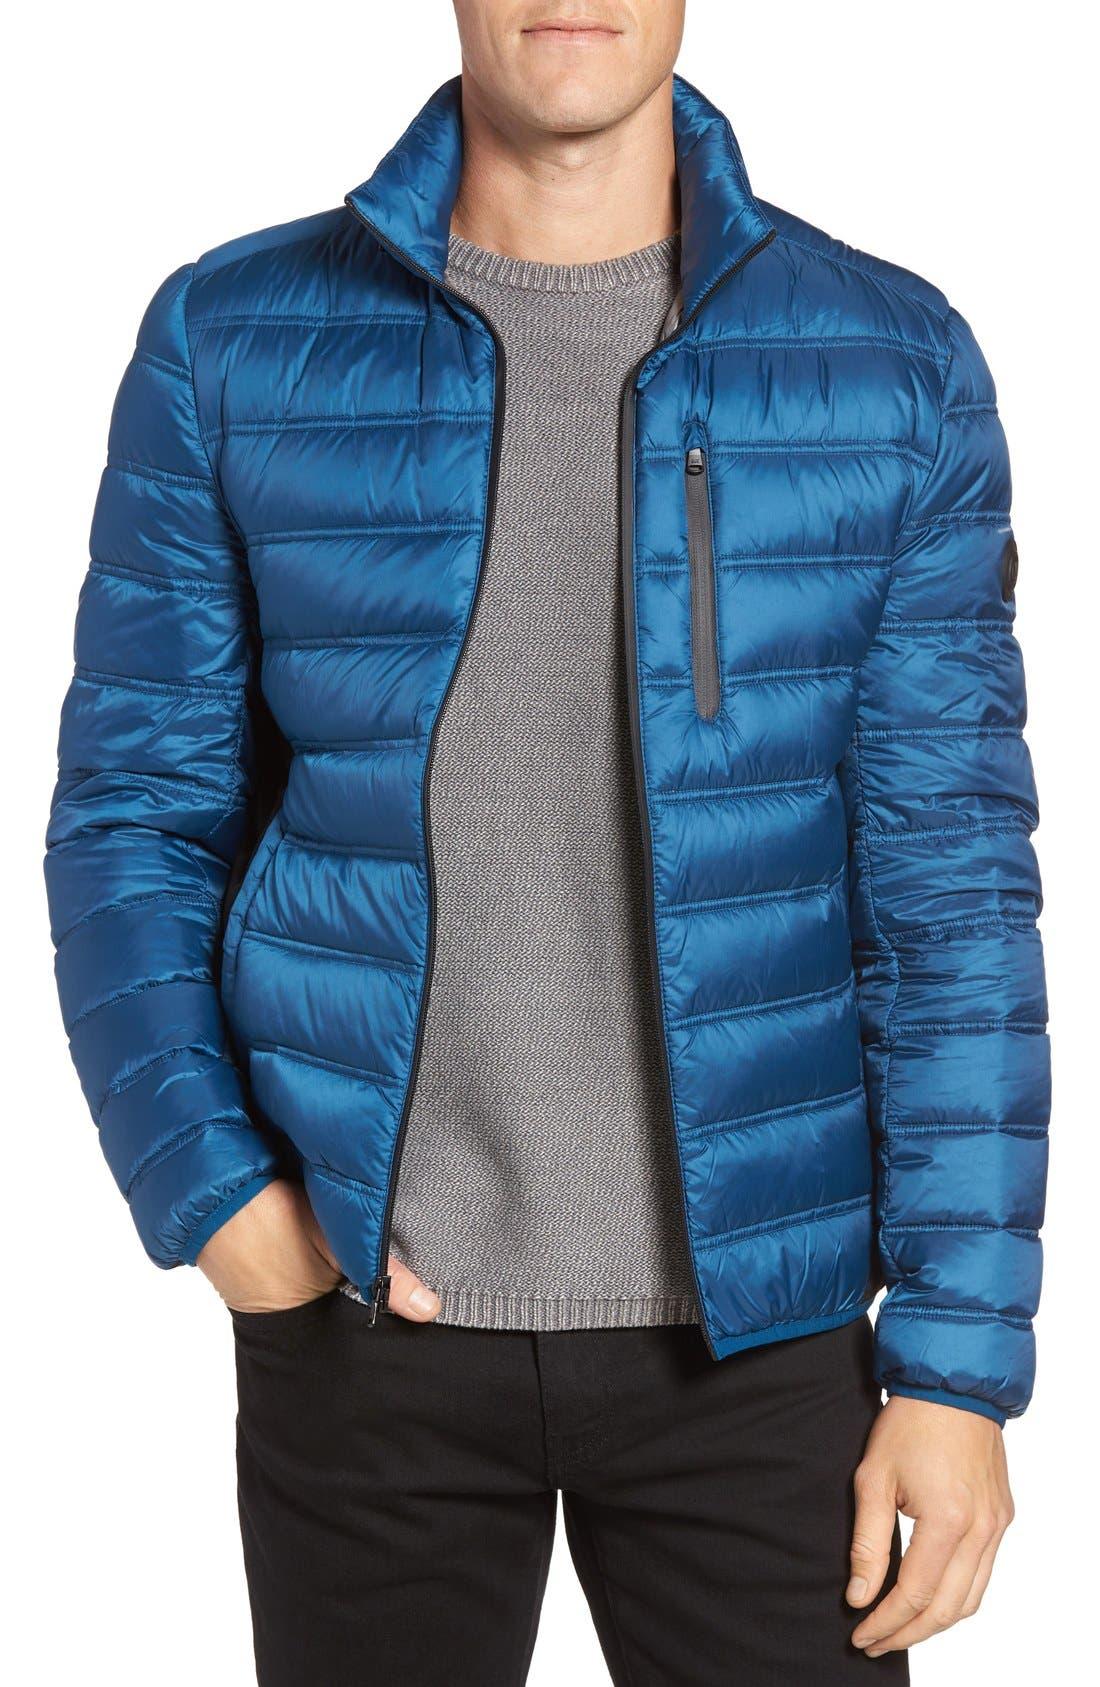 MICHAEL KORS Nylon Down Fill Jacket